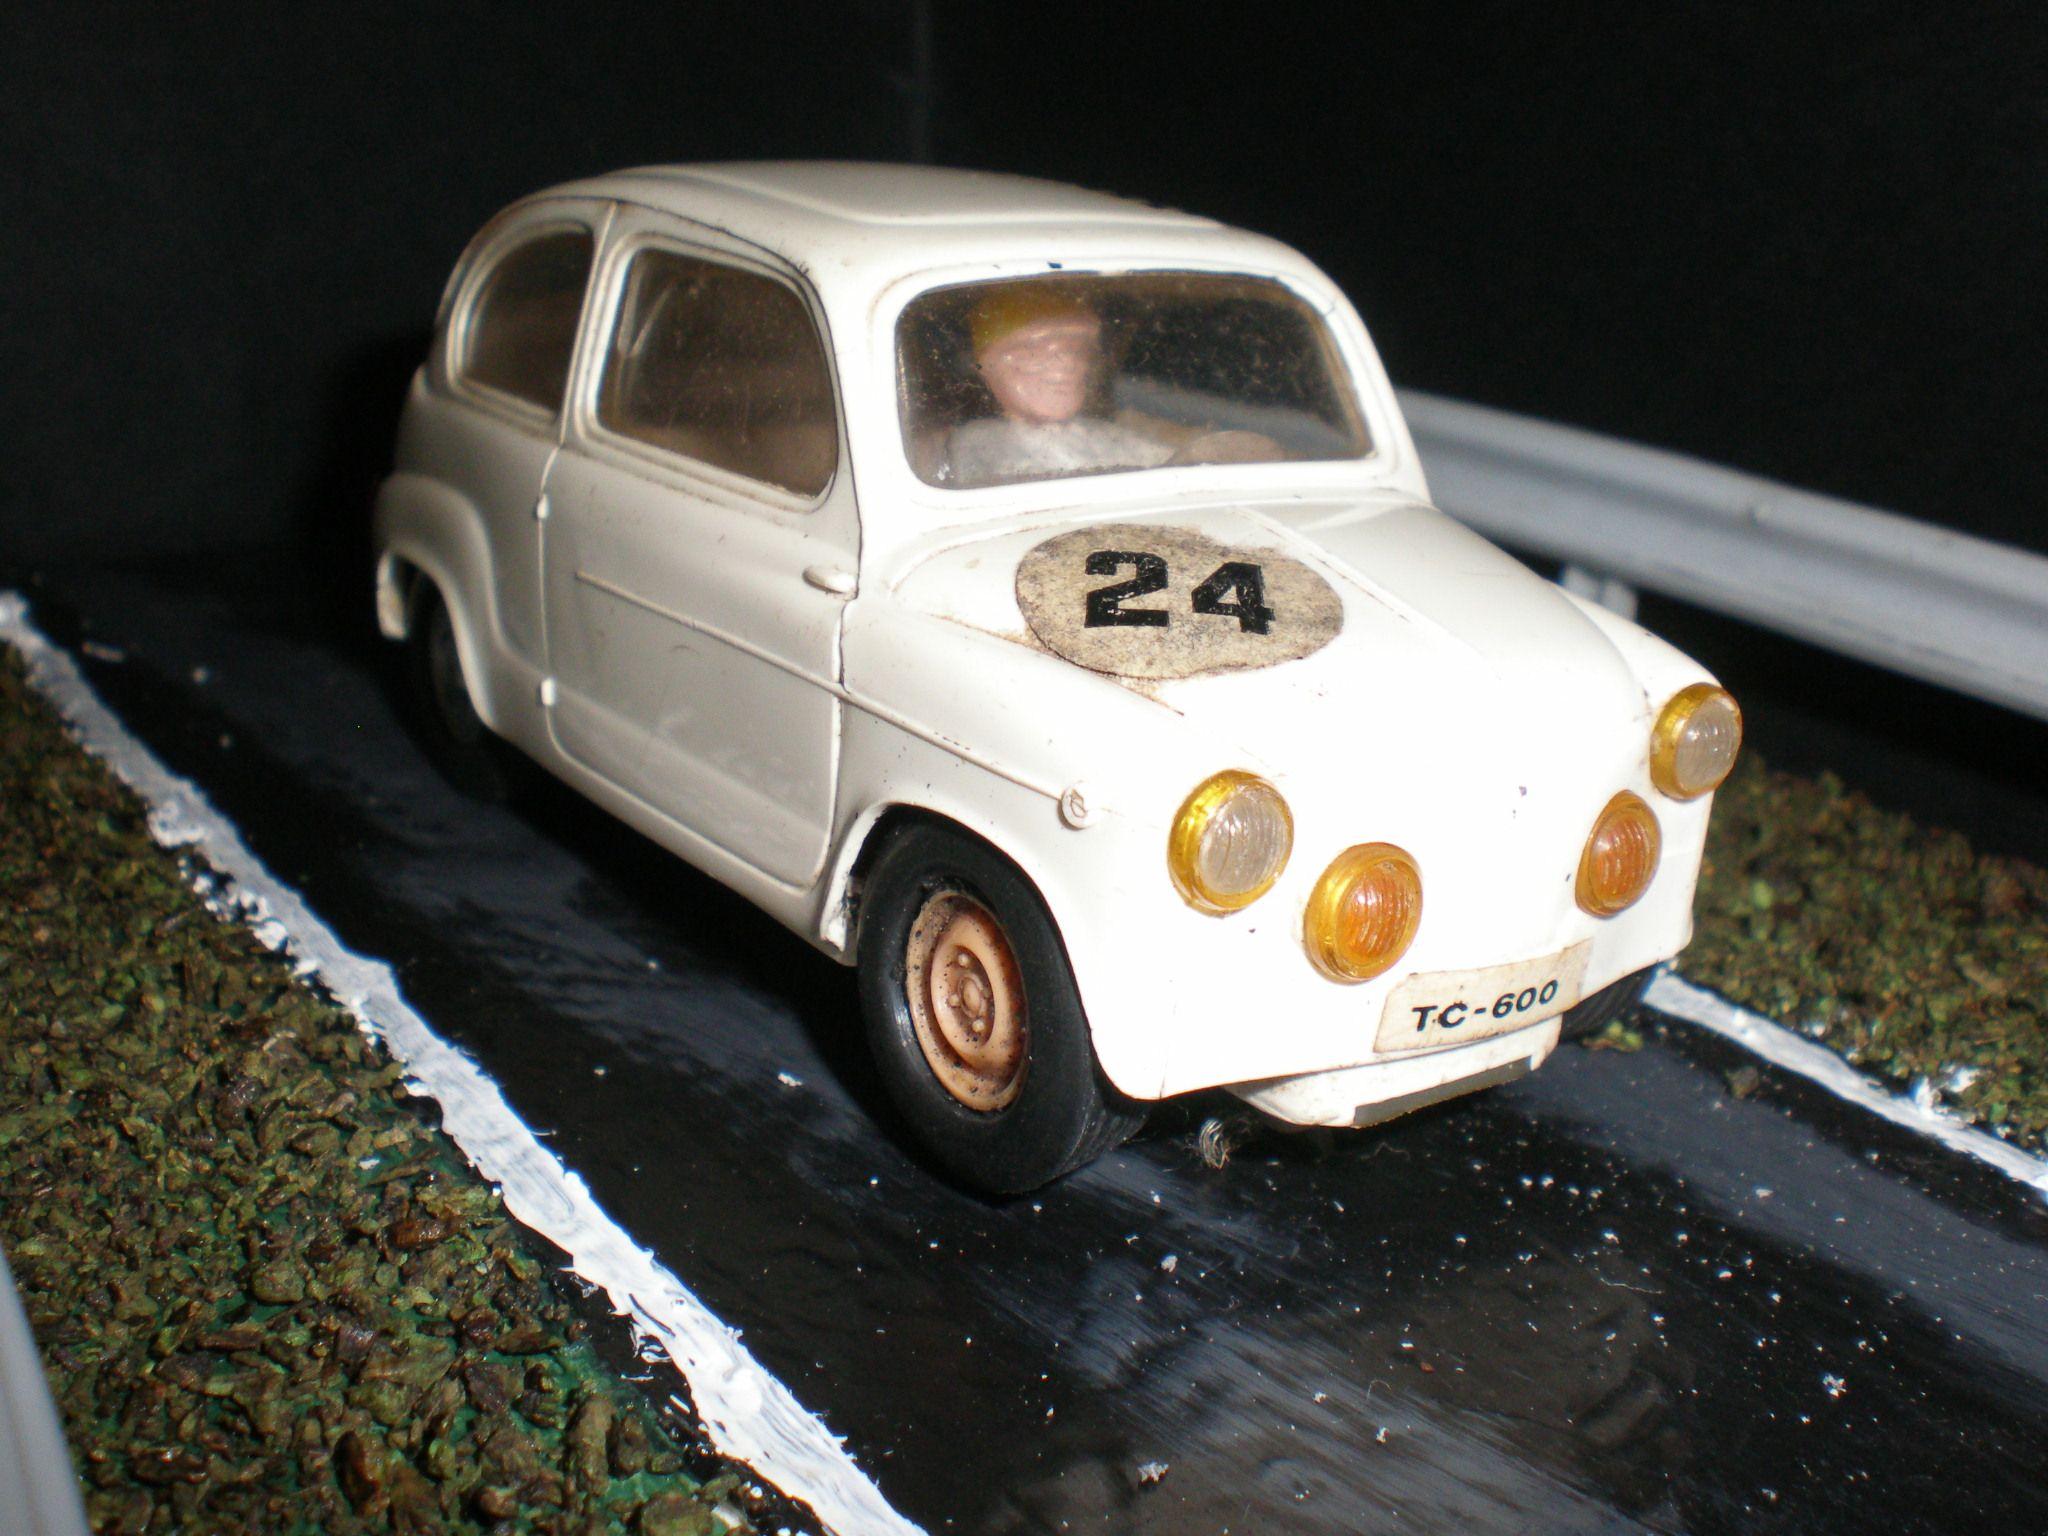 80s car toys  Seat  Exin CF  My Slot Cars  Pinterest  Cars